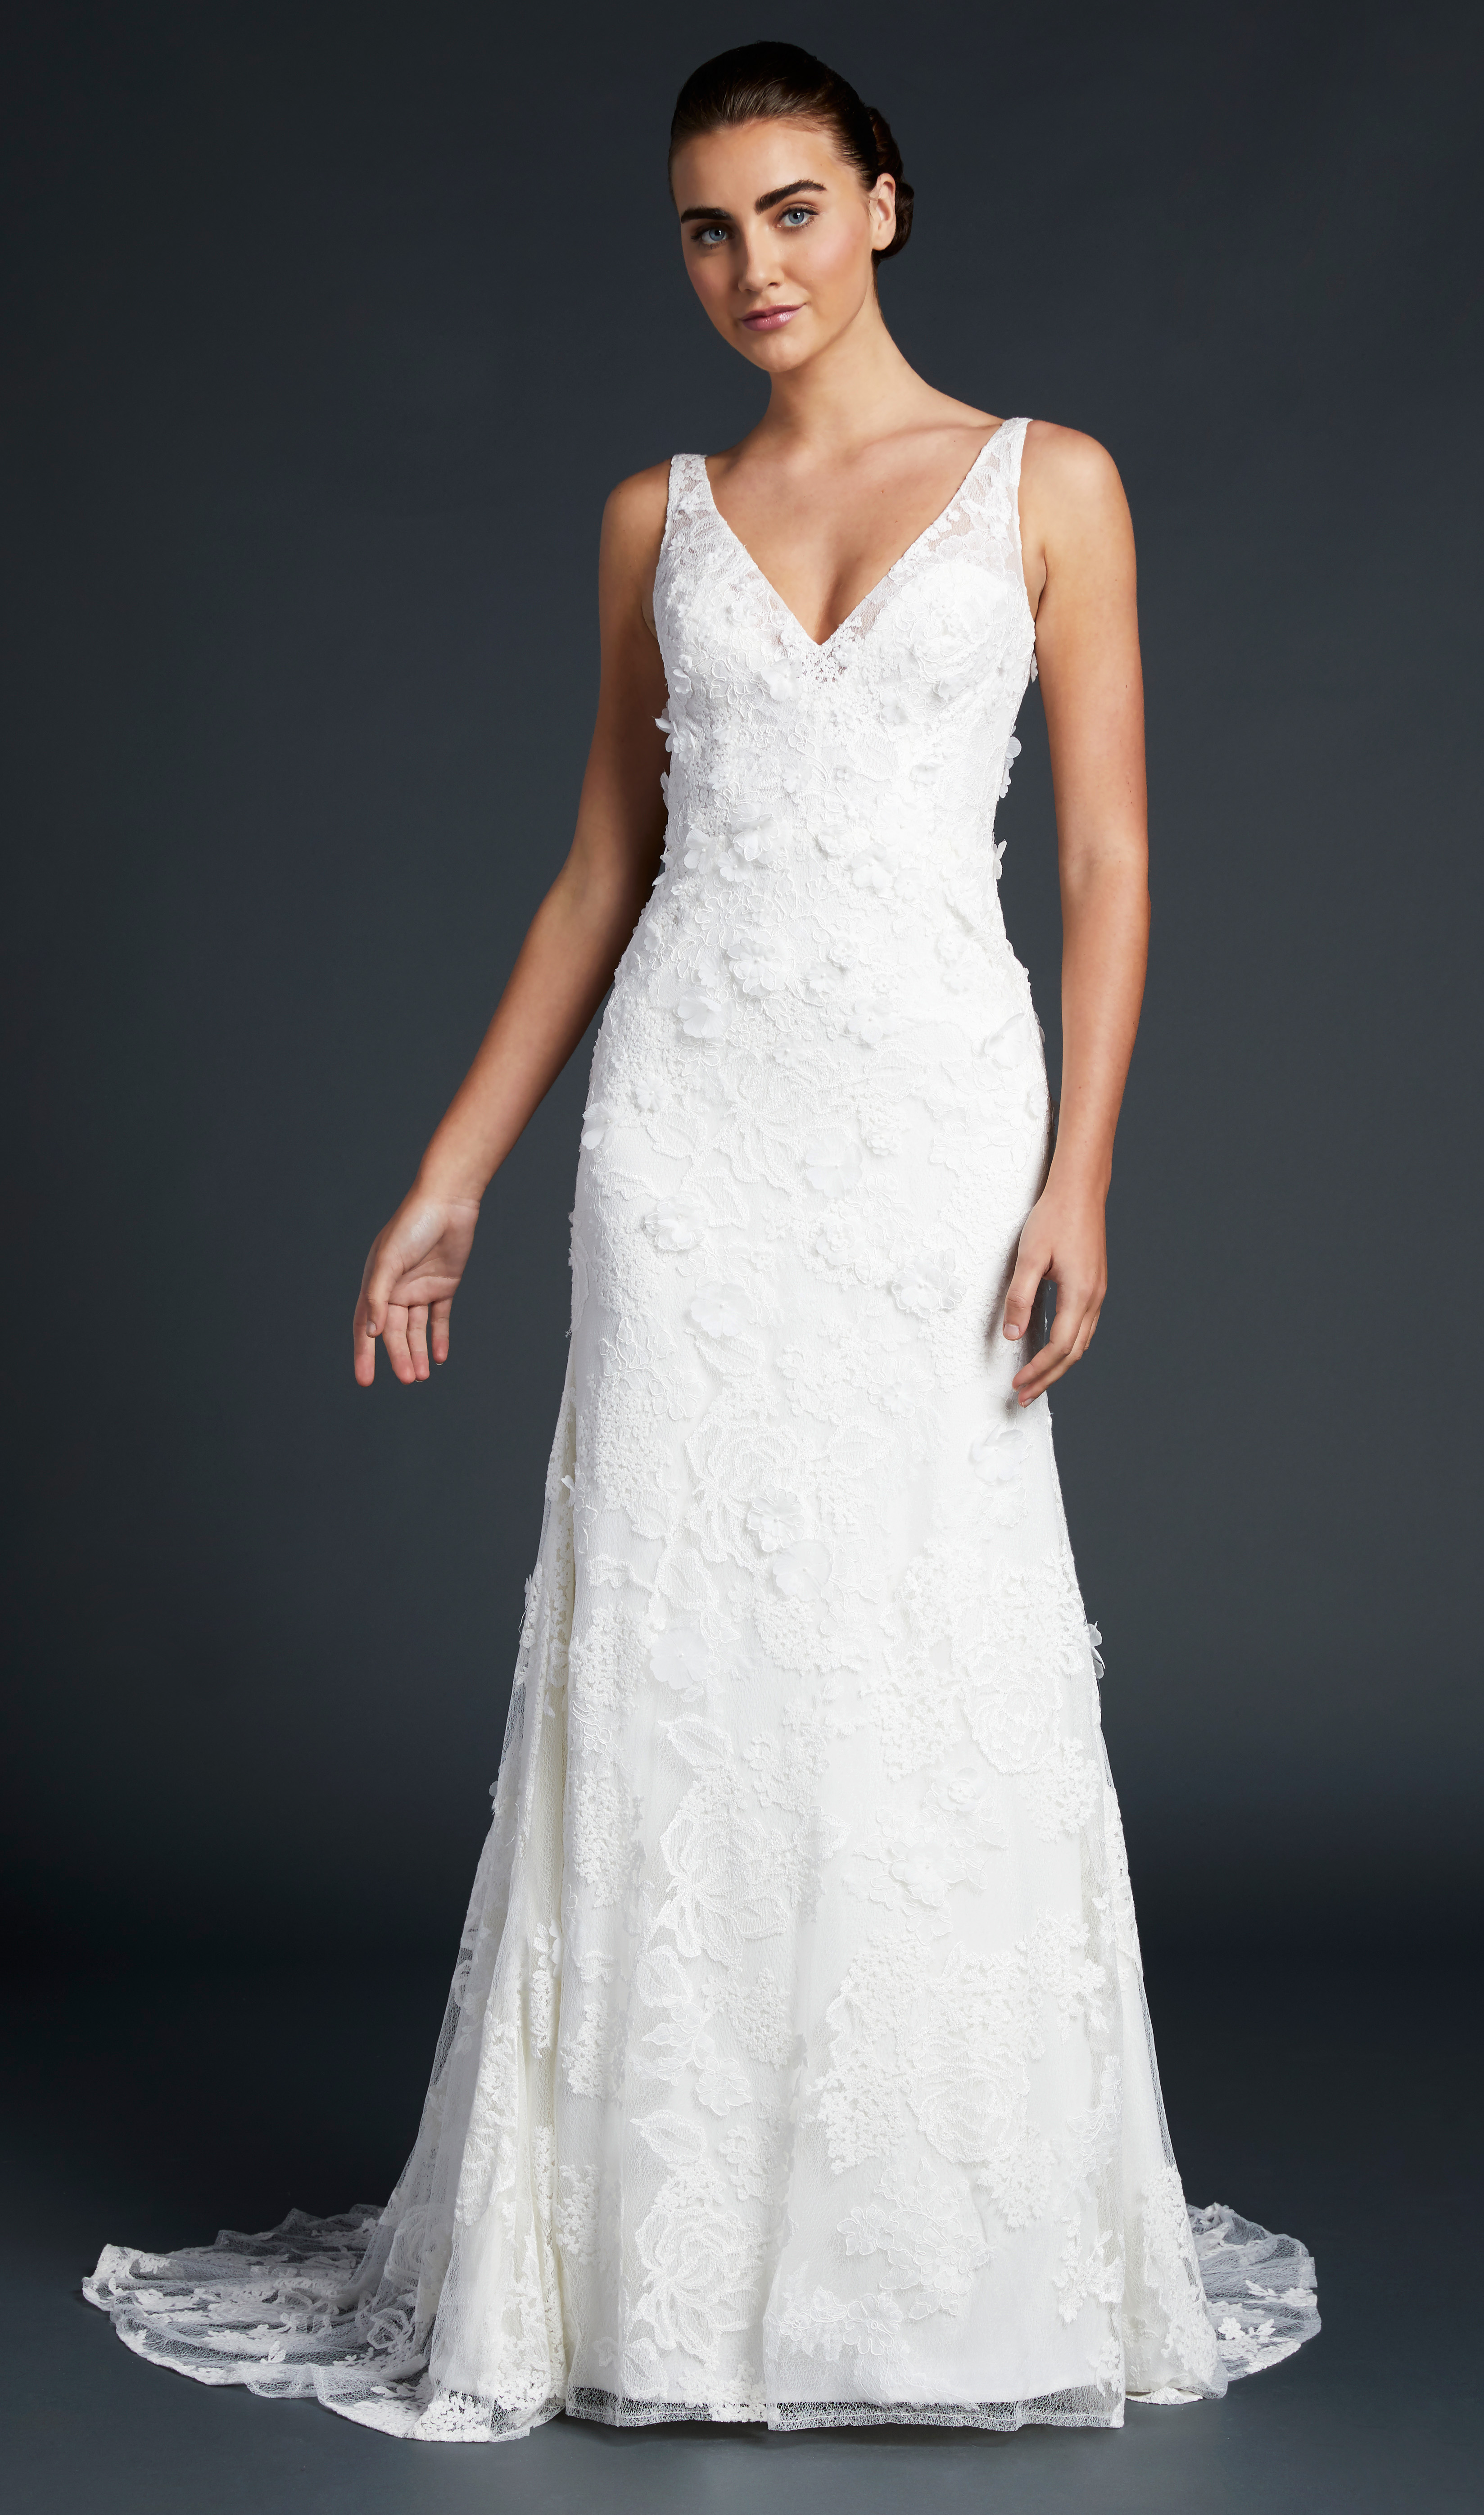 blue willow wedding dress v-neck sheath floral applique